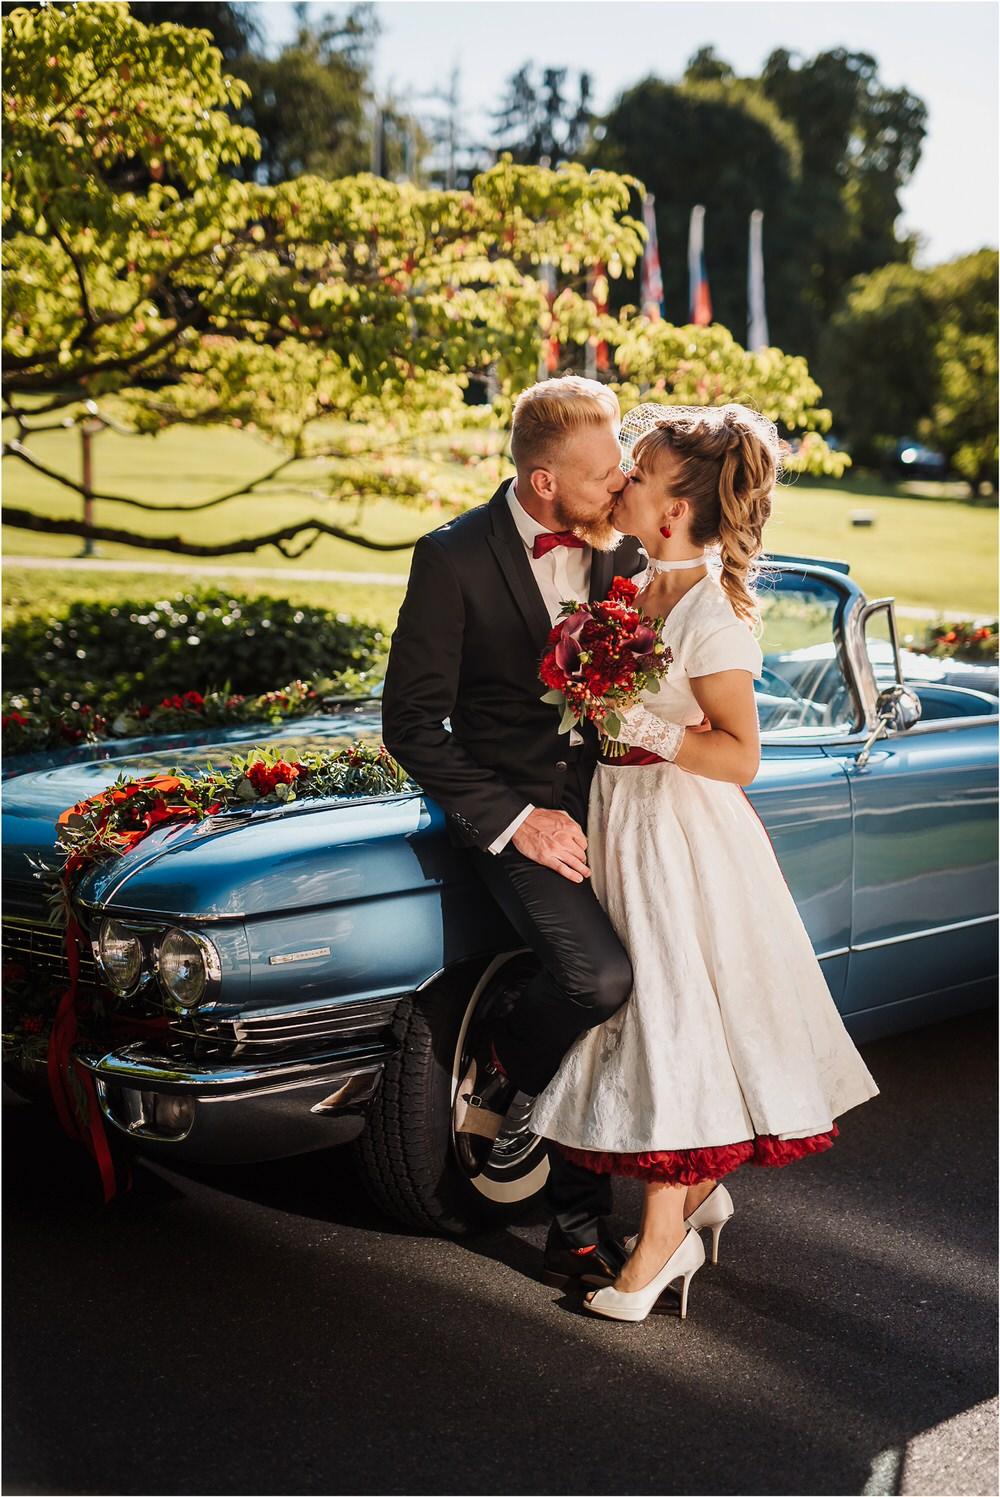 evian france wedding photographer photographer hotel royale rockabilly wedding poroka tematska nika grega themed wedding 0054.jpg